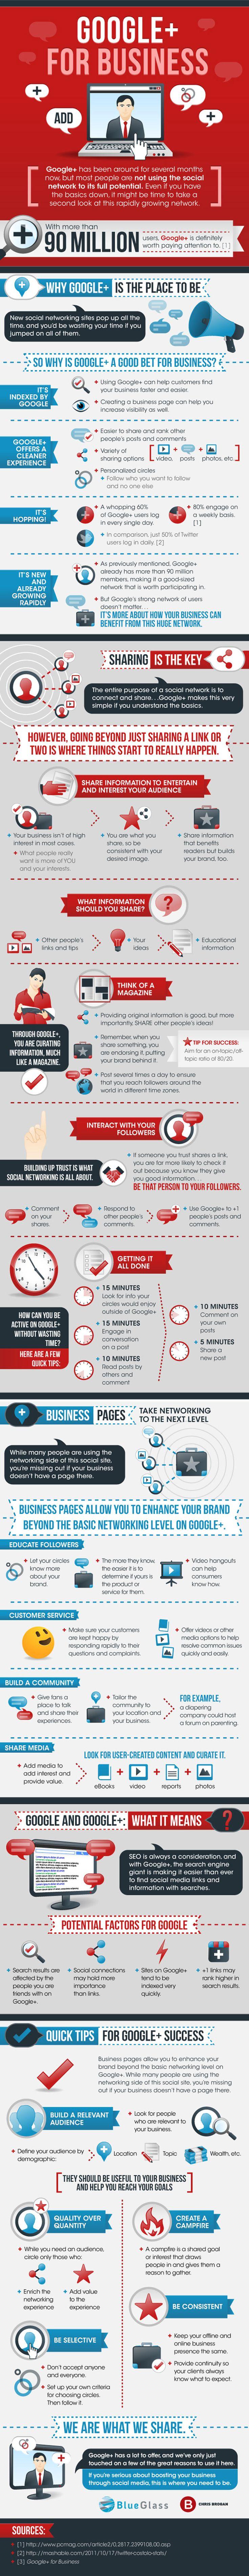 Google Plus Marketing tips Latest News & Trends in #digitalmarketing 2015   http://webworksagency.com